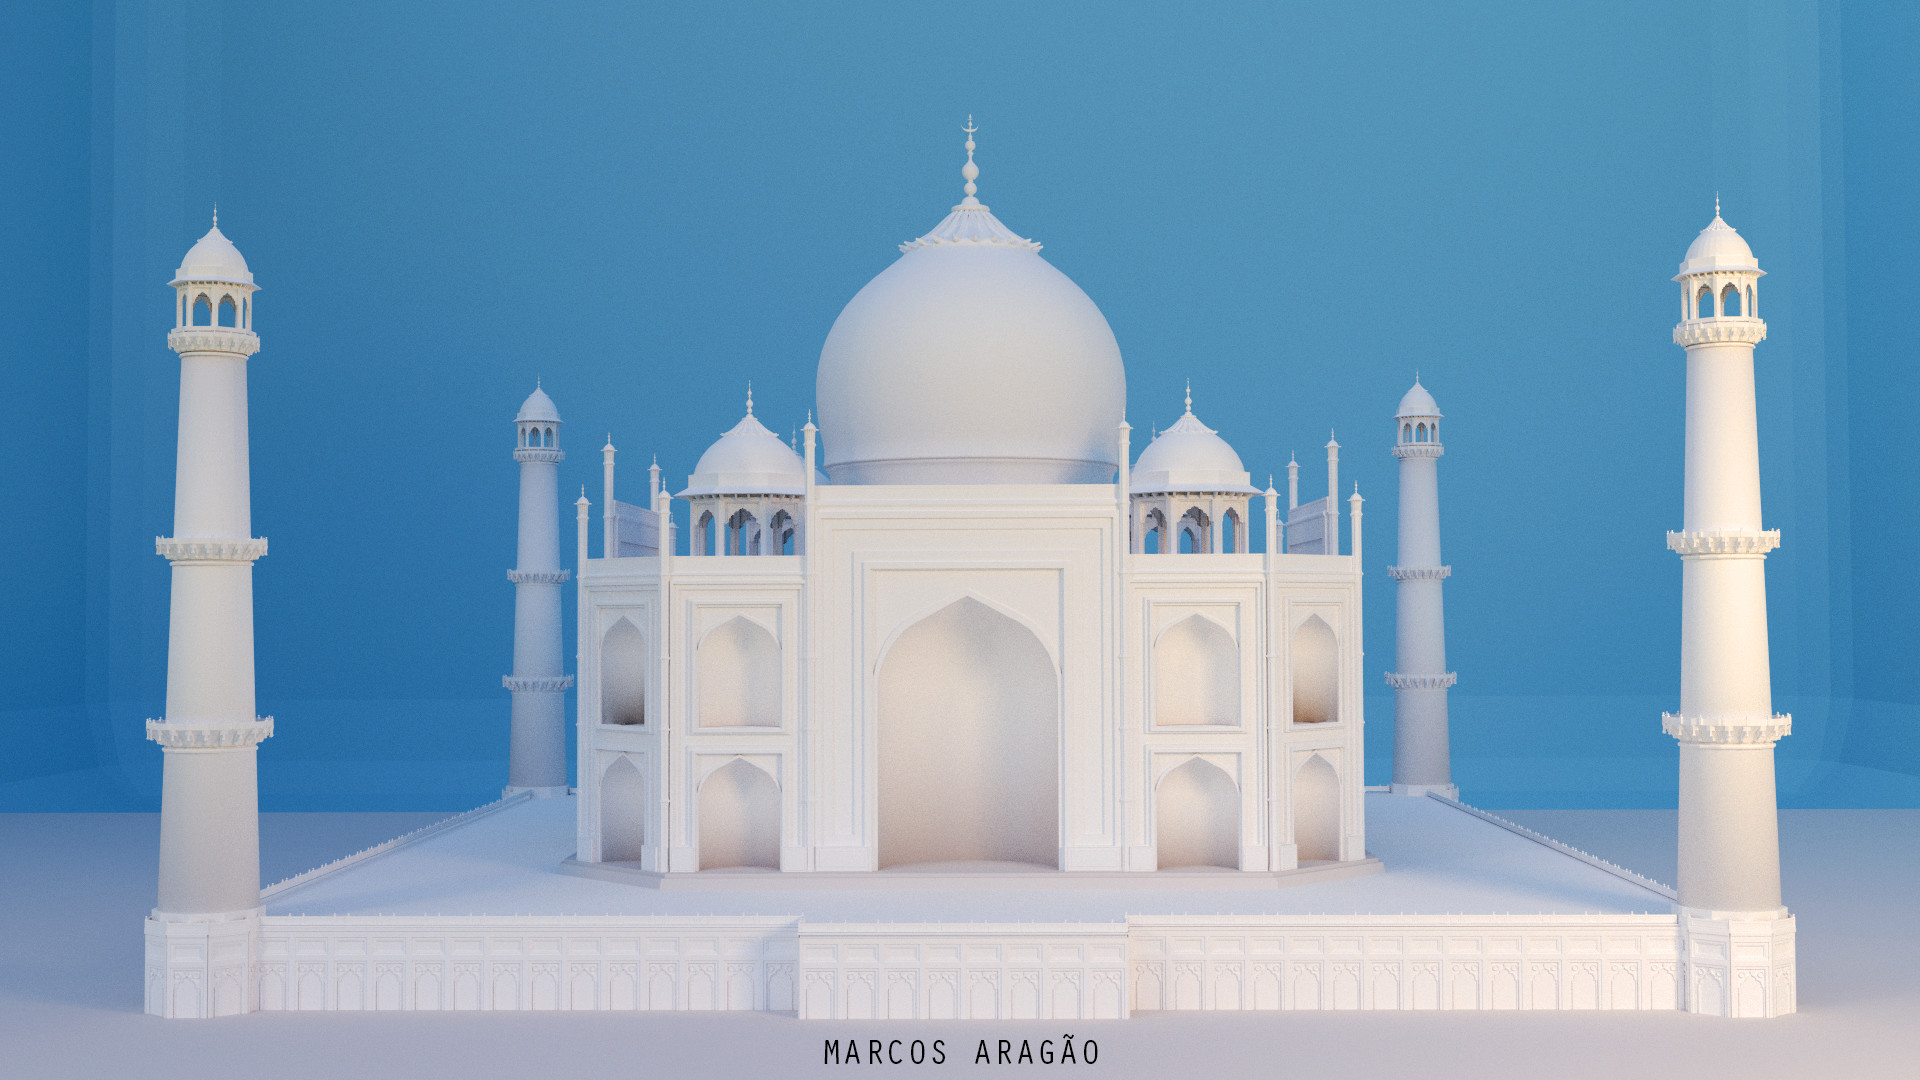 Taj Mahal 3d Image: Taj Mahal In Blender 3D, Marcos Aragão